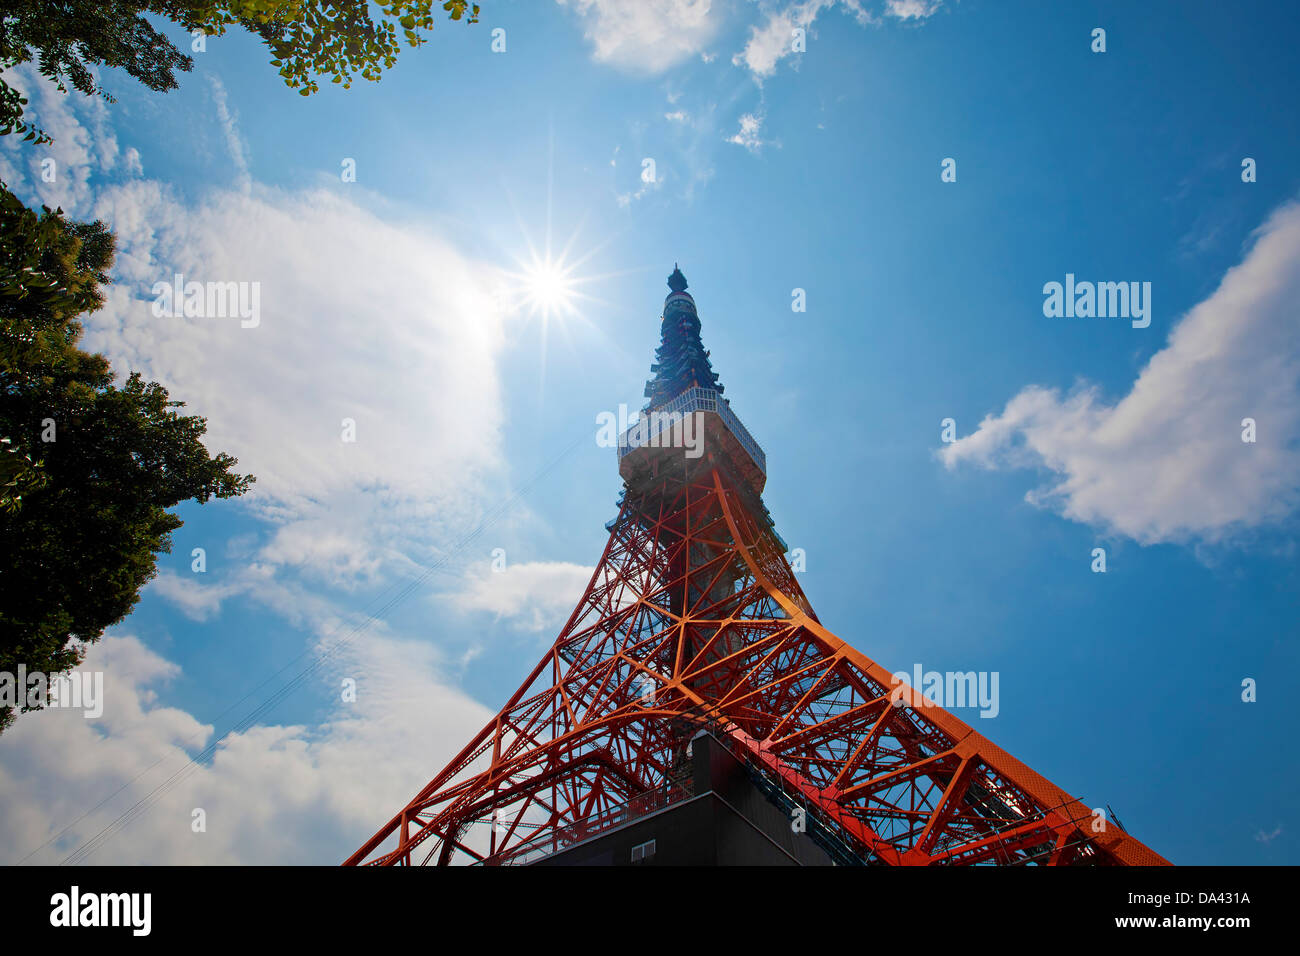 Tokyo Tower - Stock Image